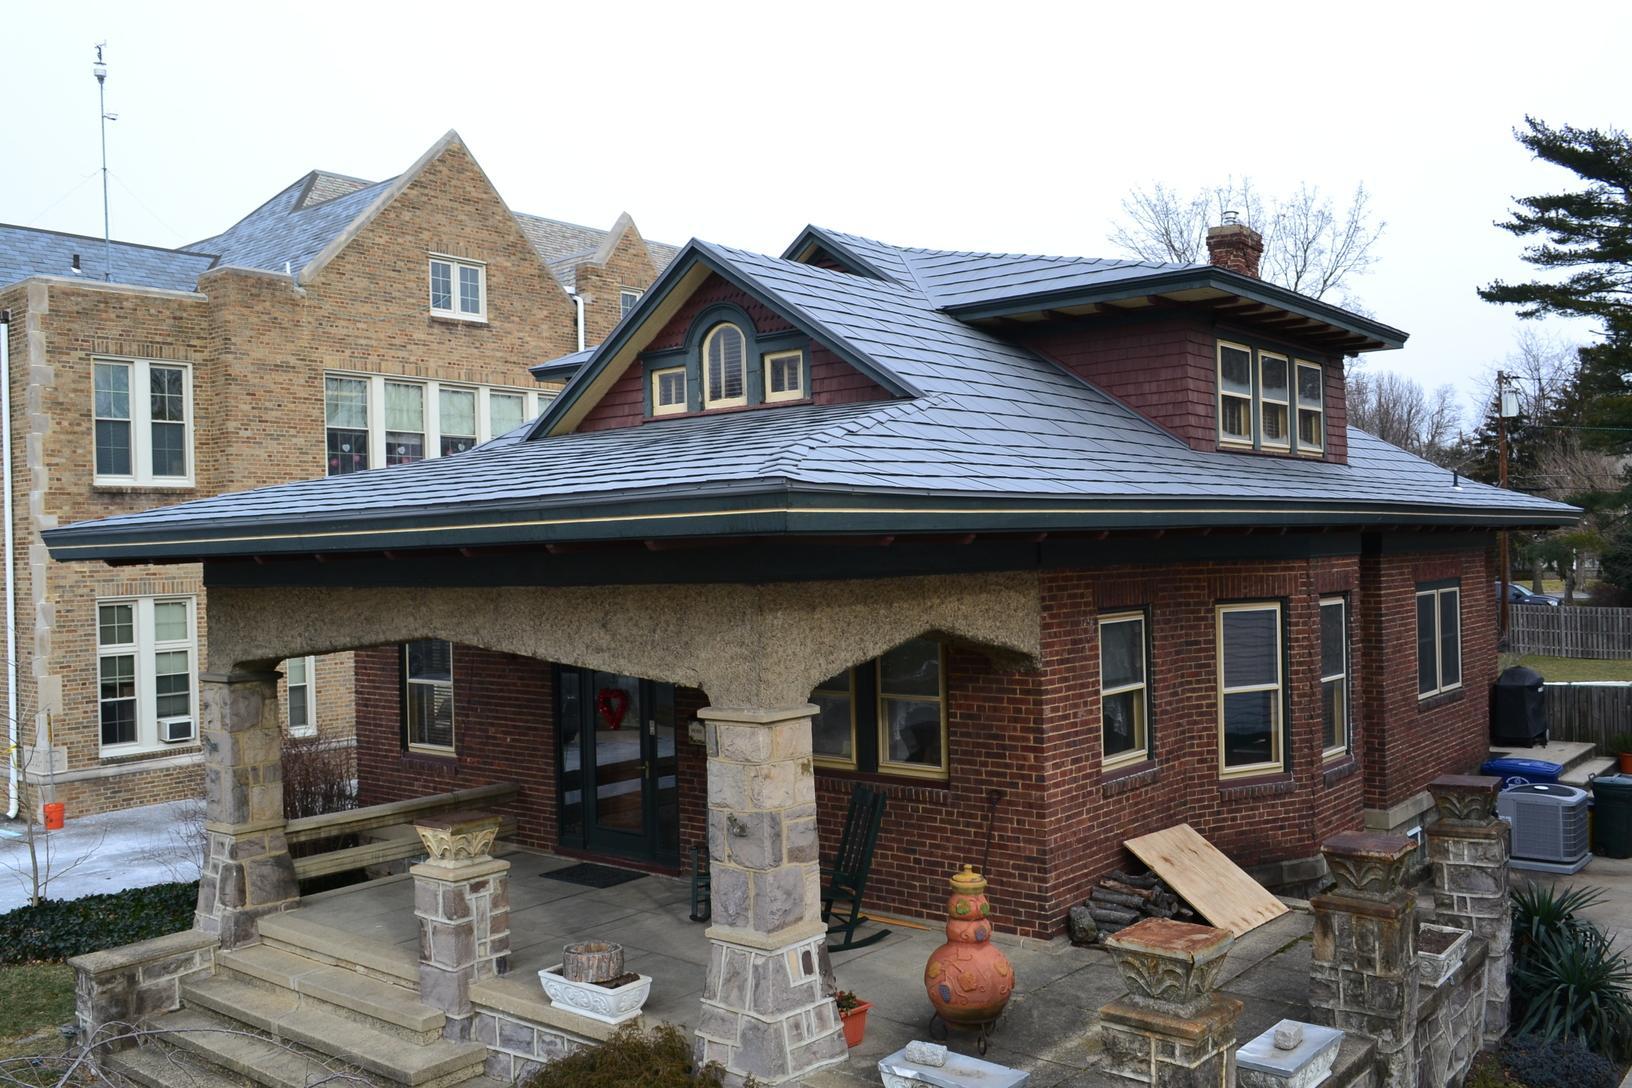 Sierra Slate Grey Tamco Metalworks Metal Slate Roof Installation in Riverton, NJ - After Photo